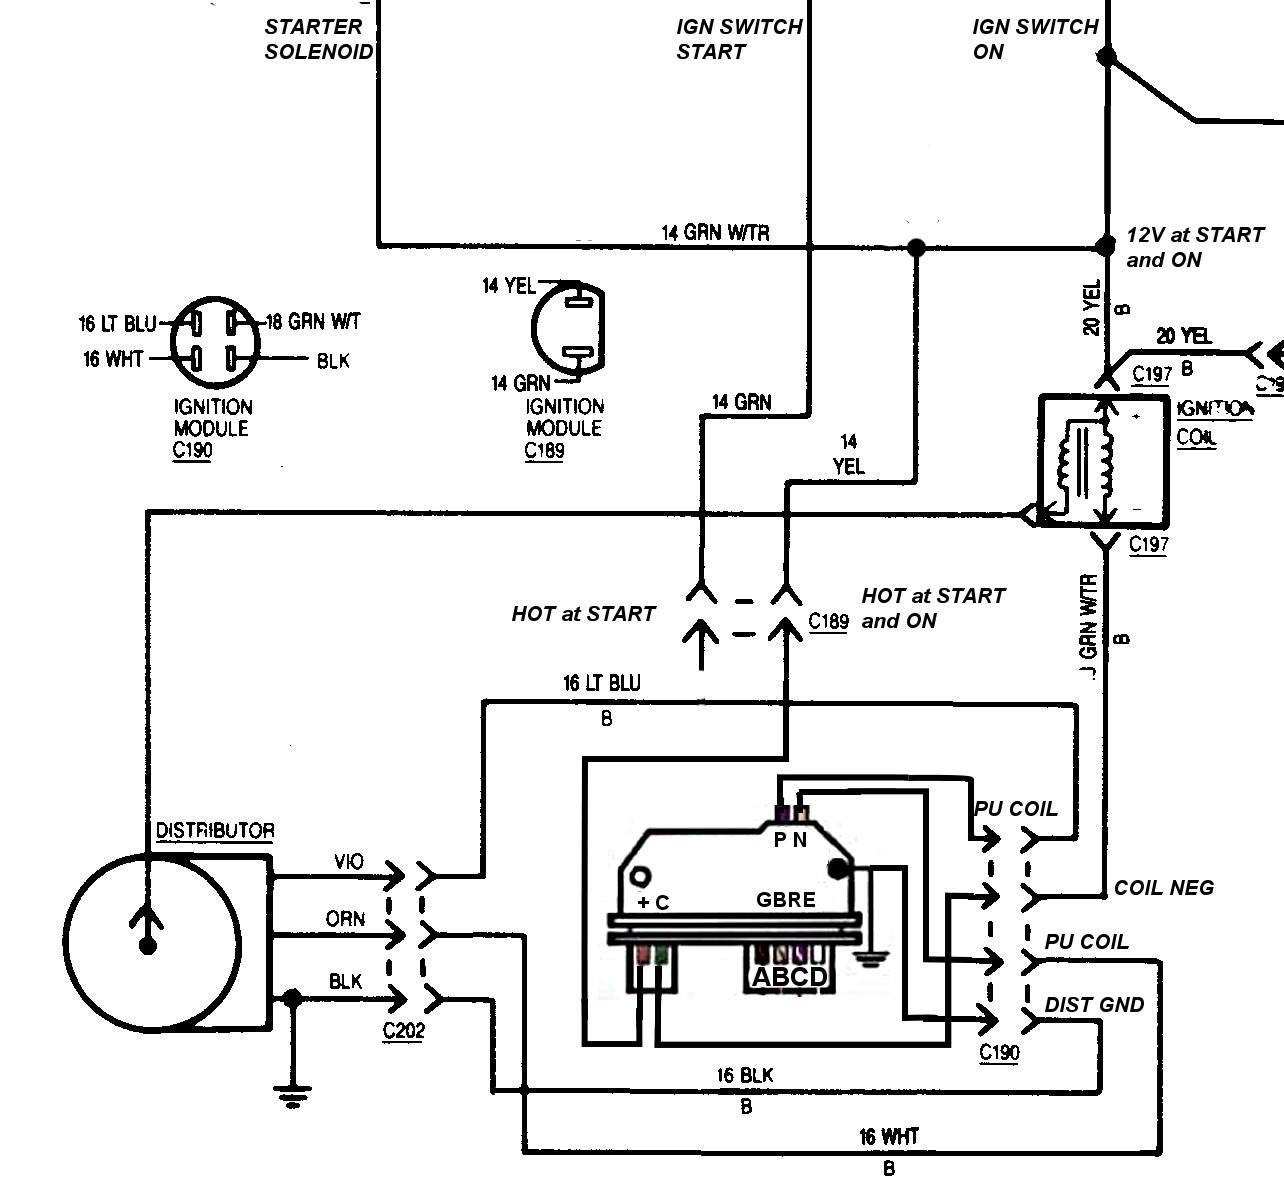 Pleasant Gm Optispark Wiring Diagram Wiring Diagram Wiring Cloud Biosomenaidewilluminateatxorg